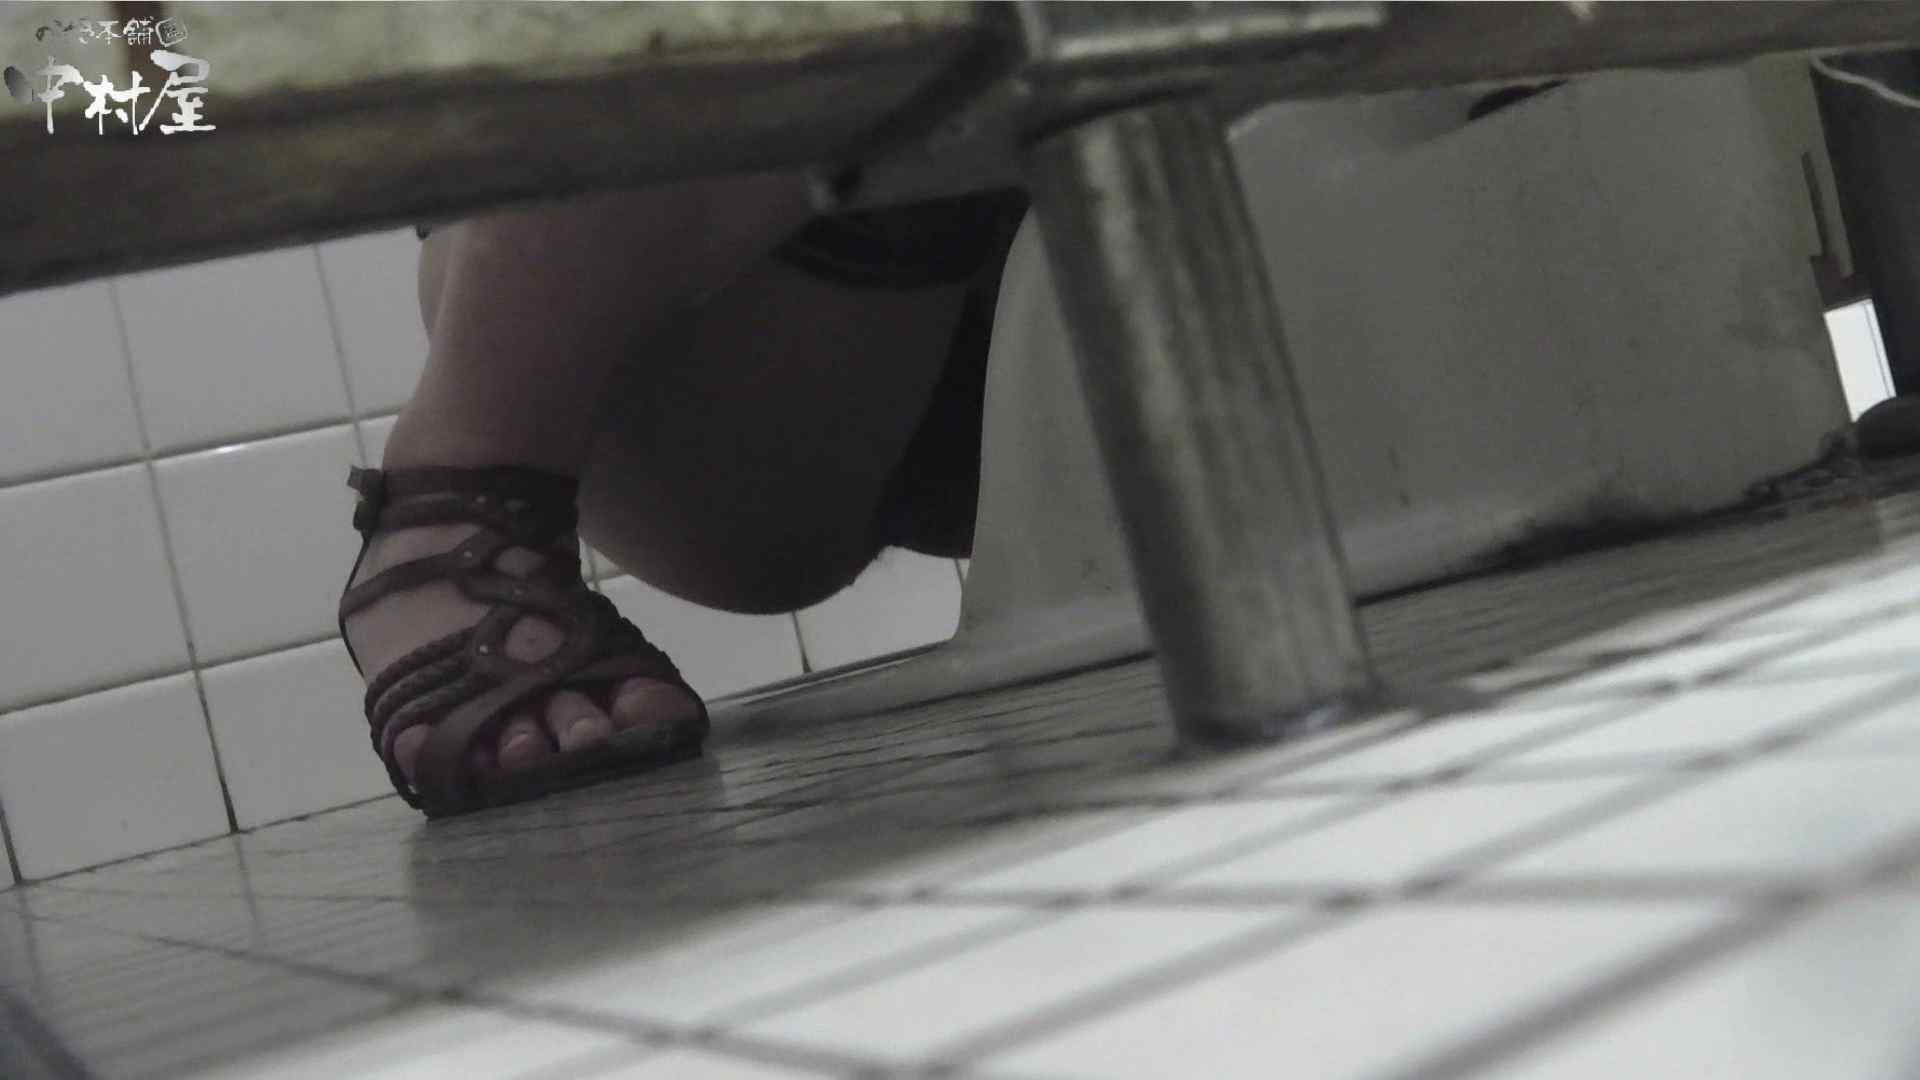 vol.42 命がけ潜伏洗面所! カカト上げながら・硬度強(太)・180g 洗面所 盗撮エロ画像 102画像 62